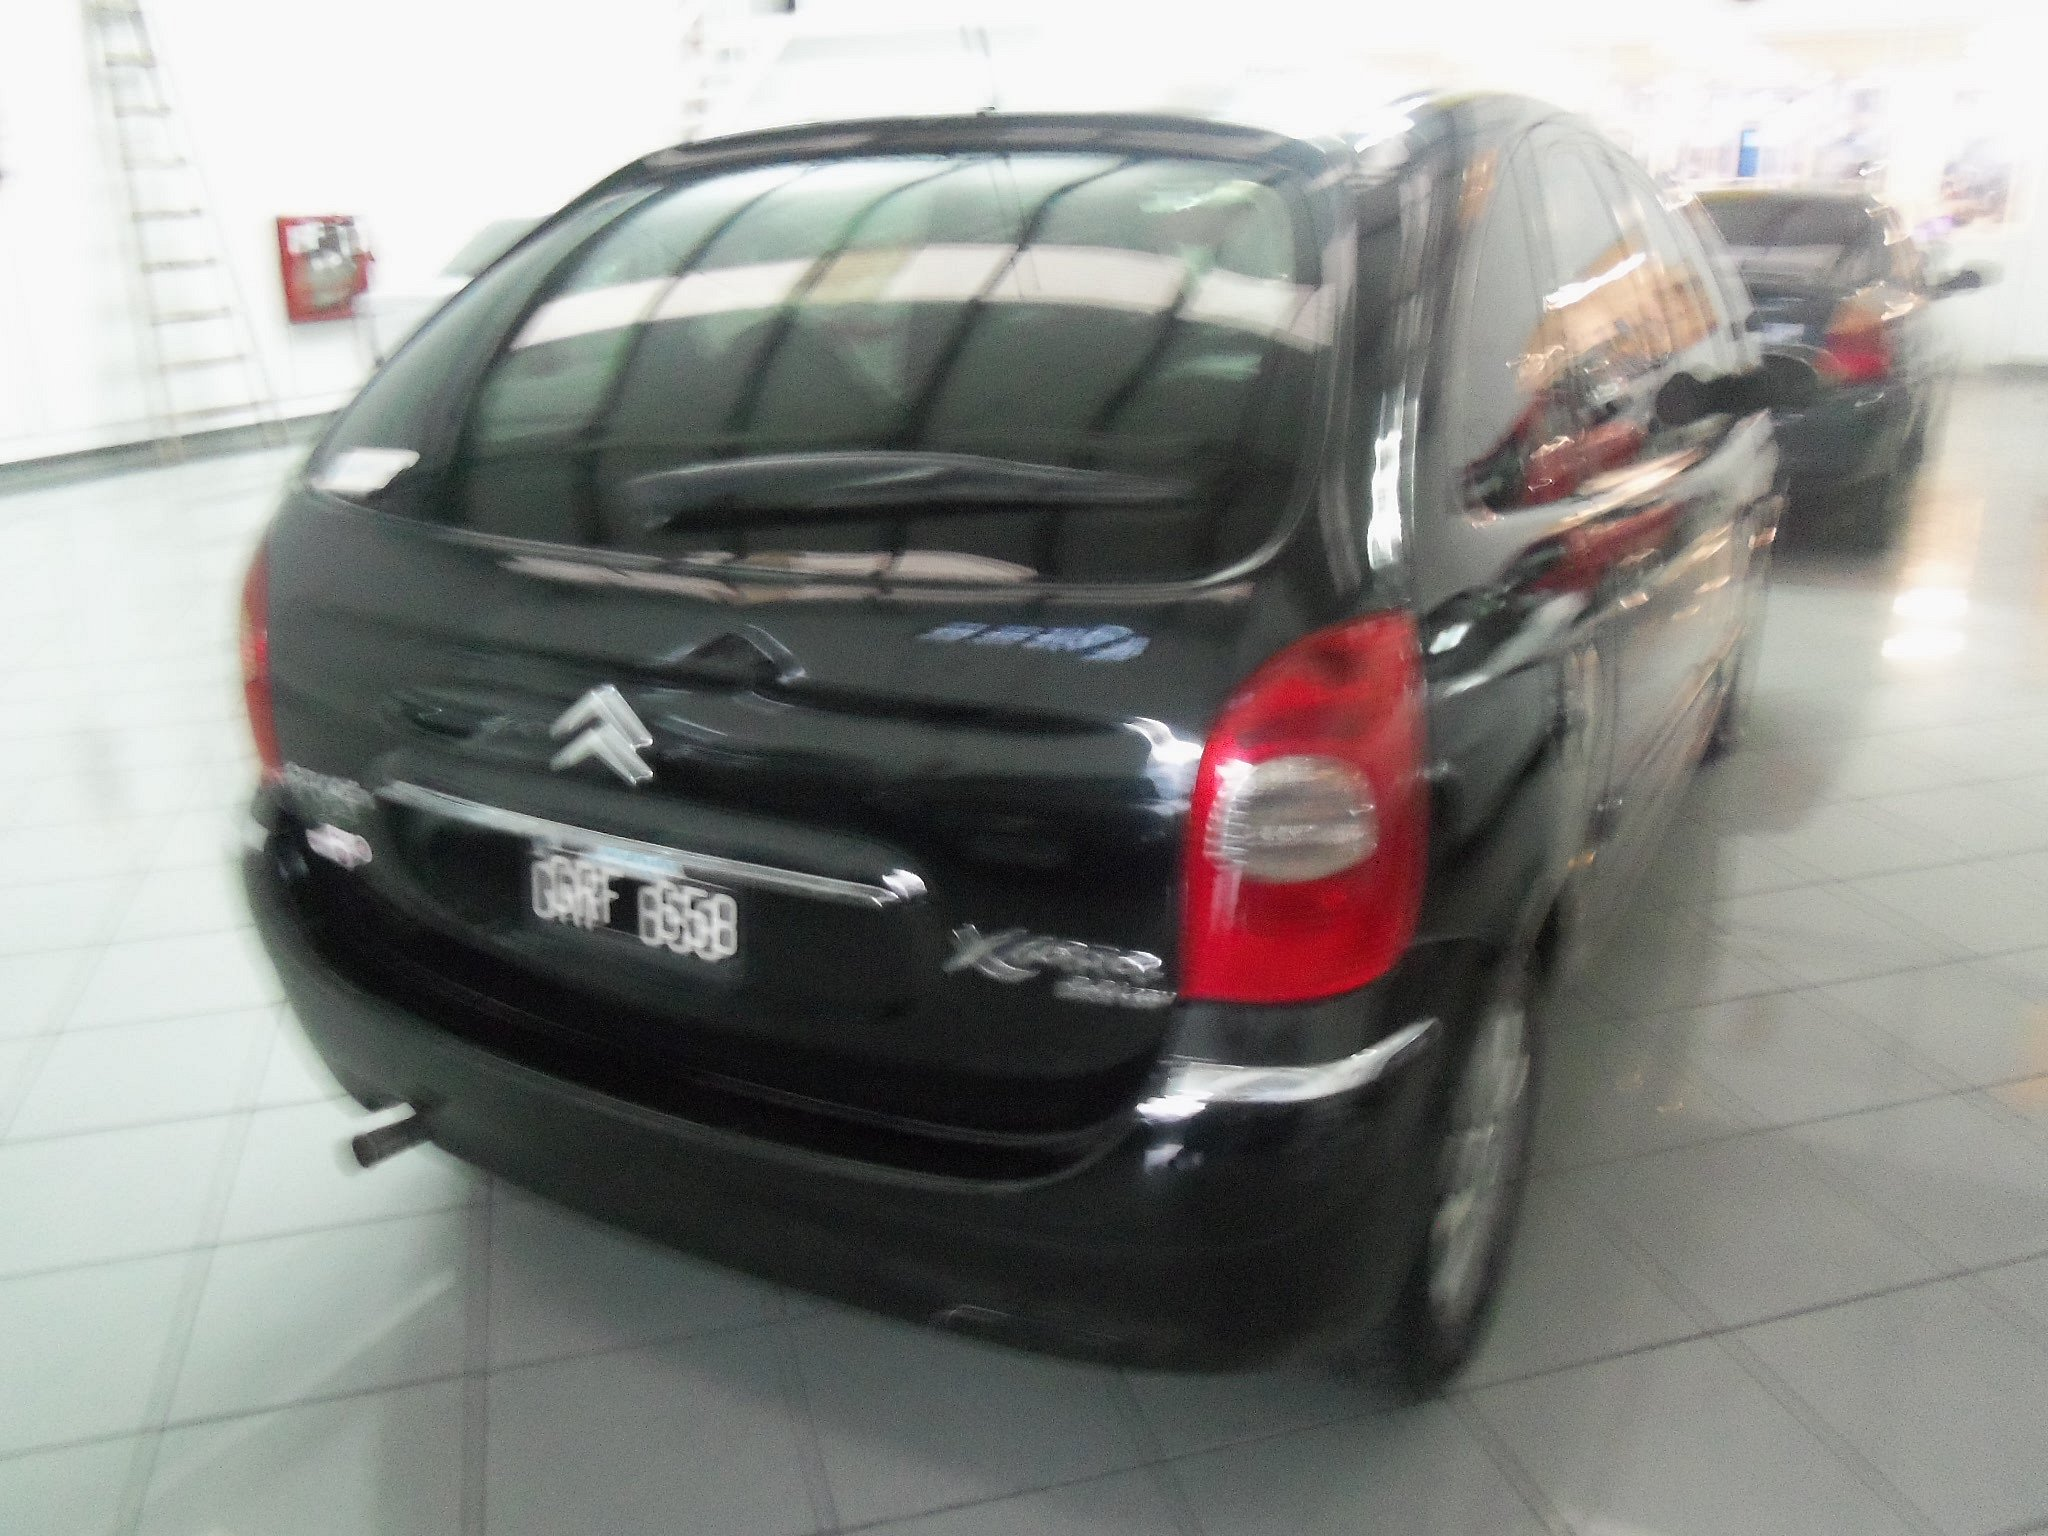 2008 Citroen Xsara Picasso 2,0L